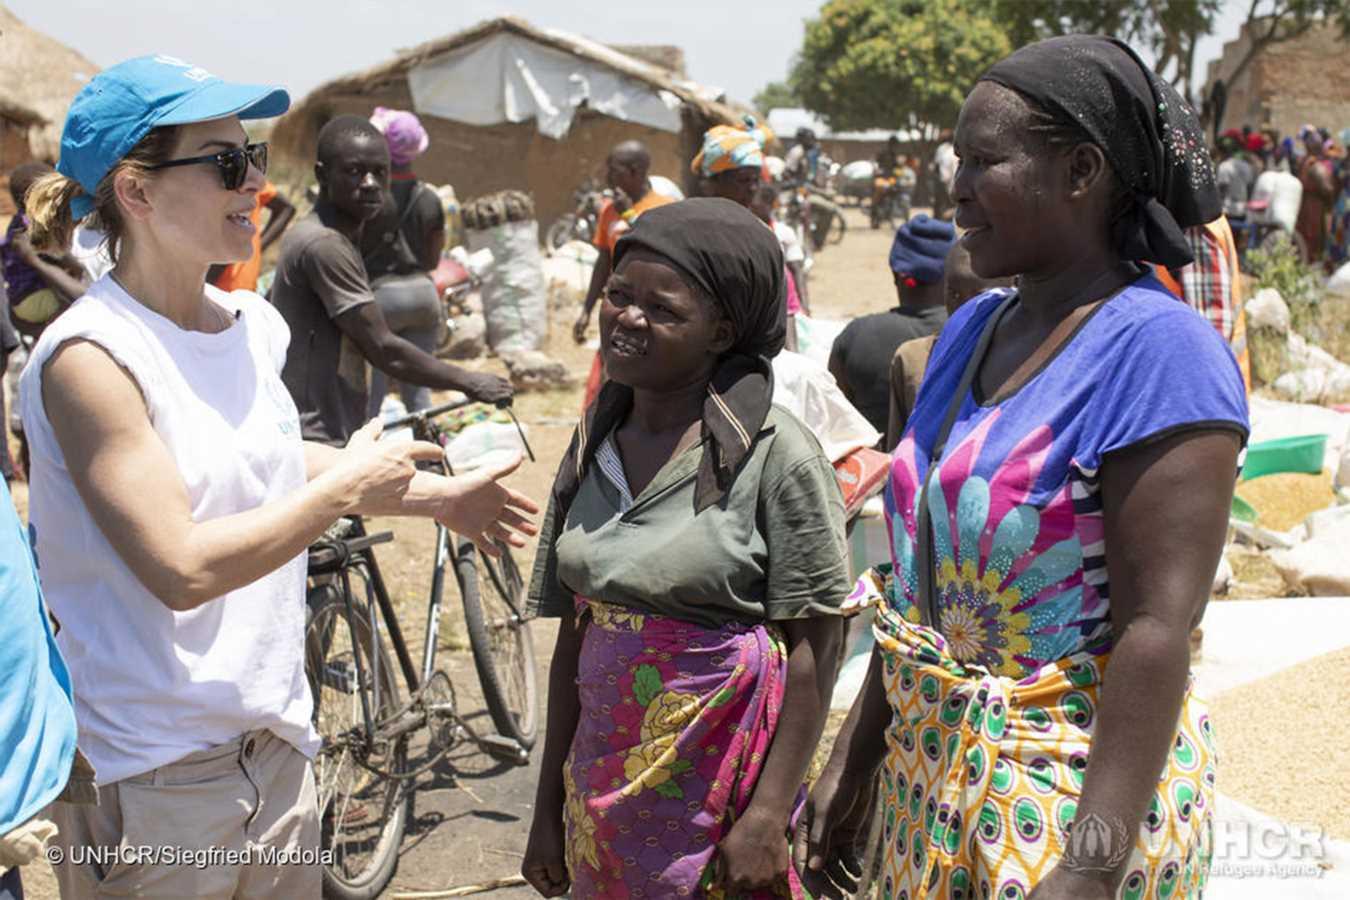 Jillian Michaels Is Walking 100 Miles to Raise 'Desperately Needed' Money for Sudanese Refugees